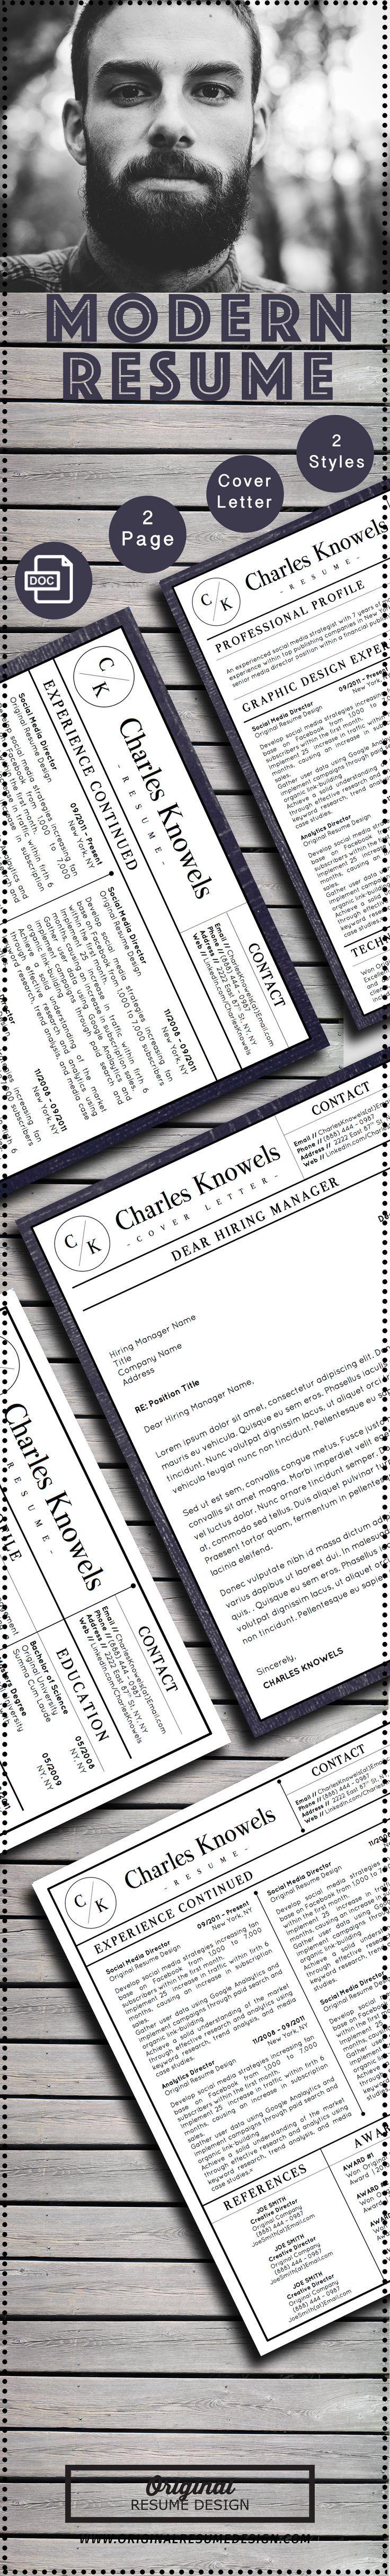 Resume writing services reno nv